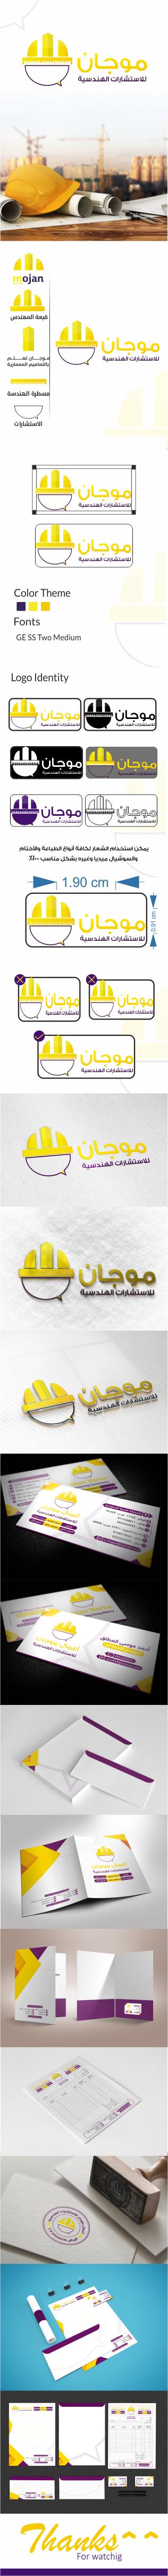 Mojan Company Branding